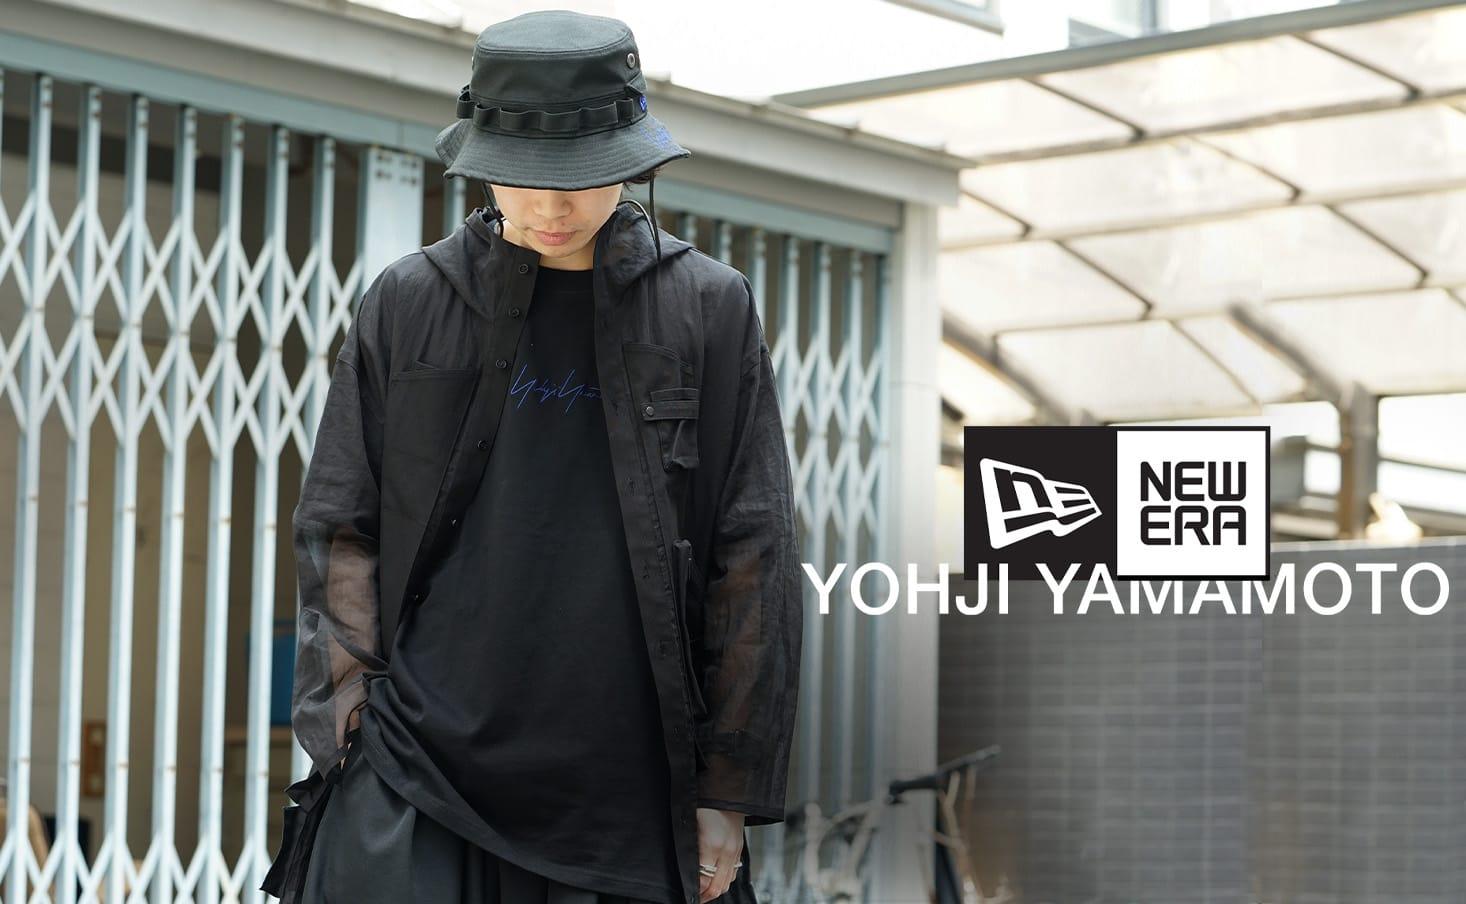 Yohji Yamamoto New Era 2019 Spring Summer Collection